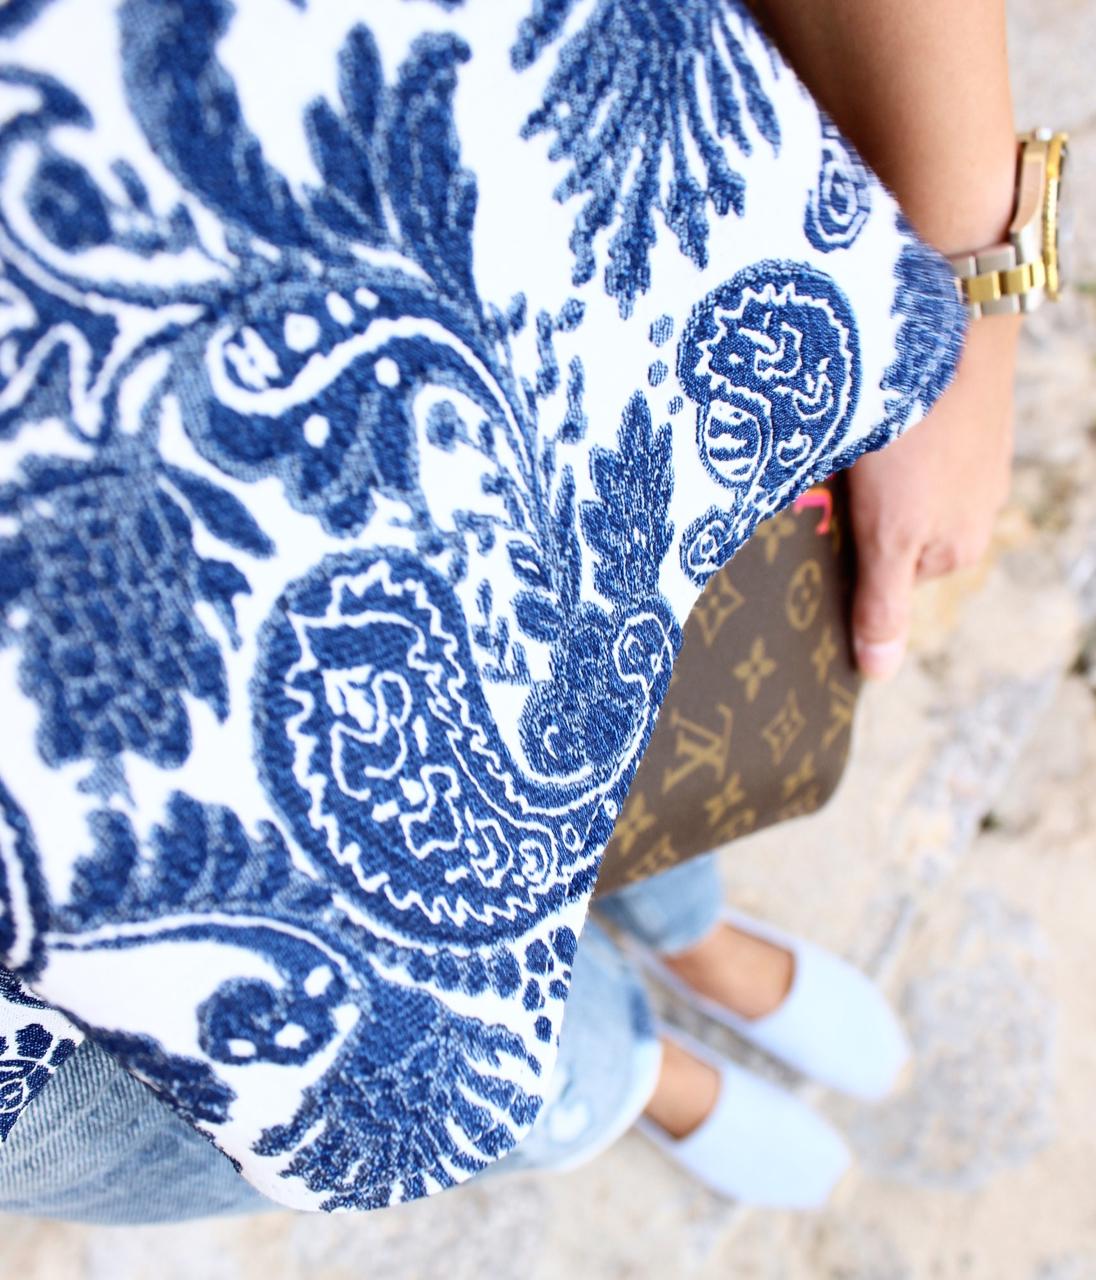 Boyfriend Jeans Outfit auf Mallorca LouisVuitton LV Vuitton Andratx Boyfriend Denim Fashion Mango Mode Soludos Travel Zara Reise Look Jennifer Jenni PepperAndGold